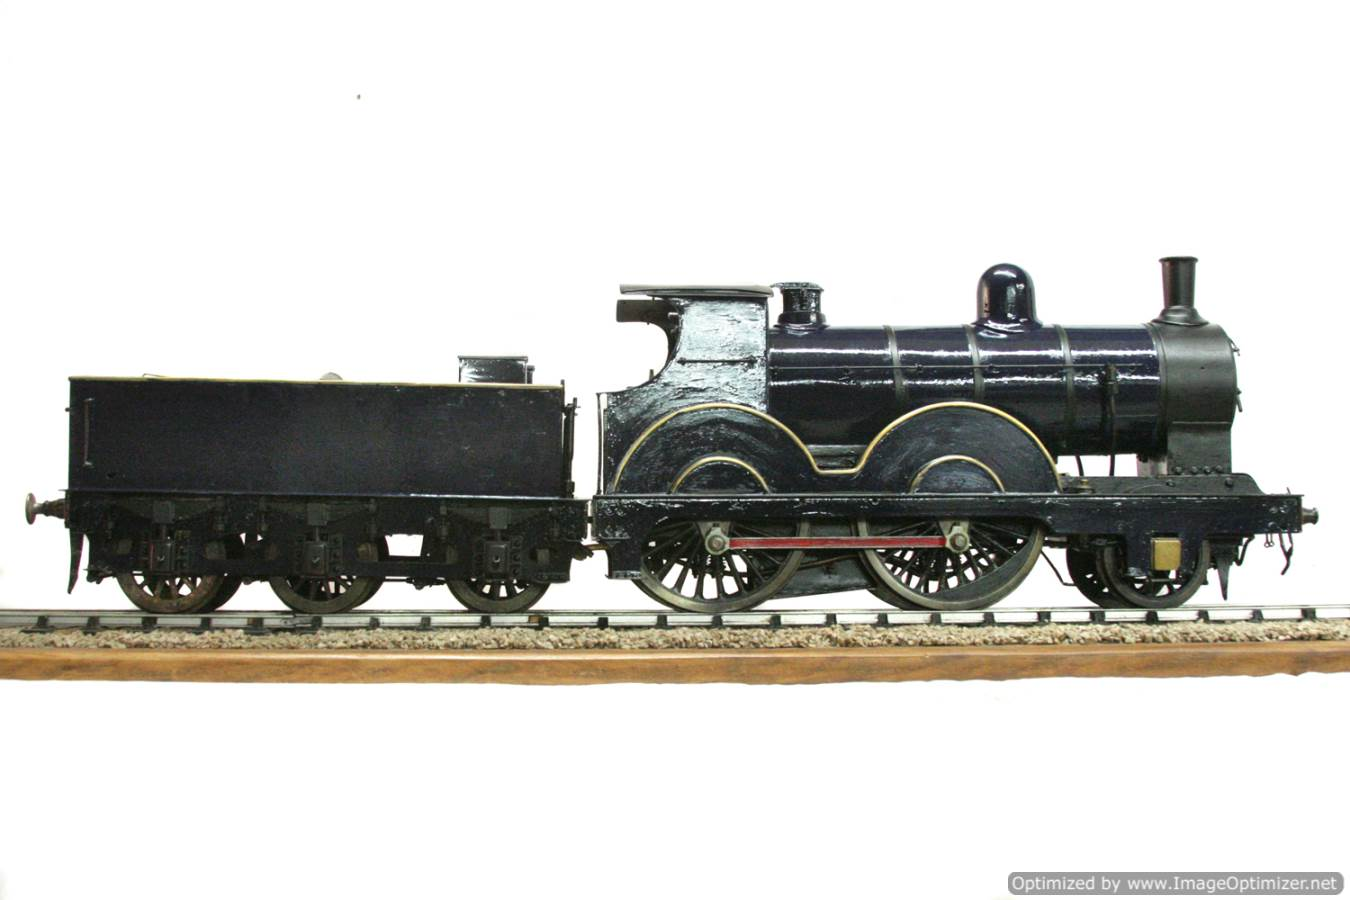 test Petrolea live steam locomotive for sale 01 Optimized